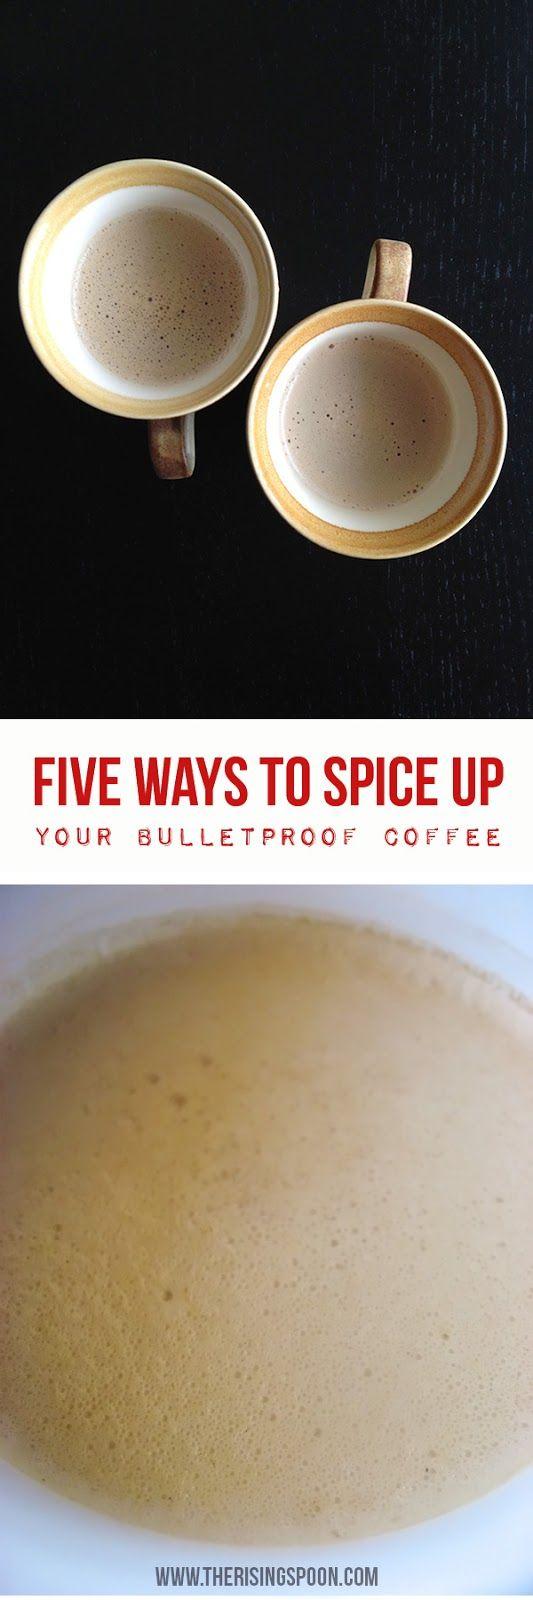 the 25 best ideas about bulletproof coffee on pinterest bullet